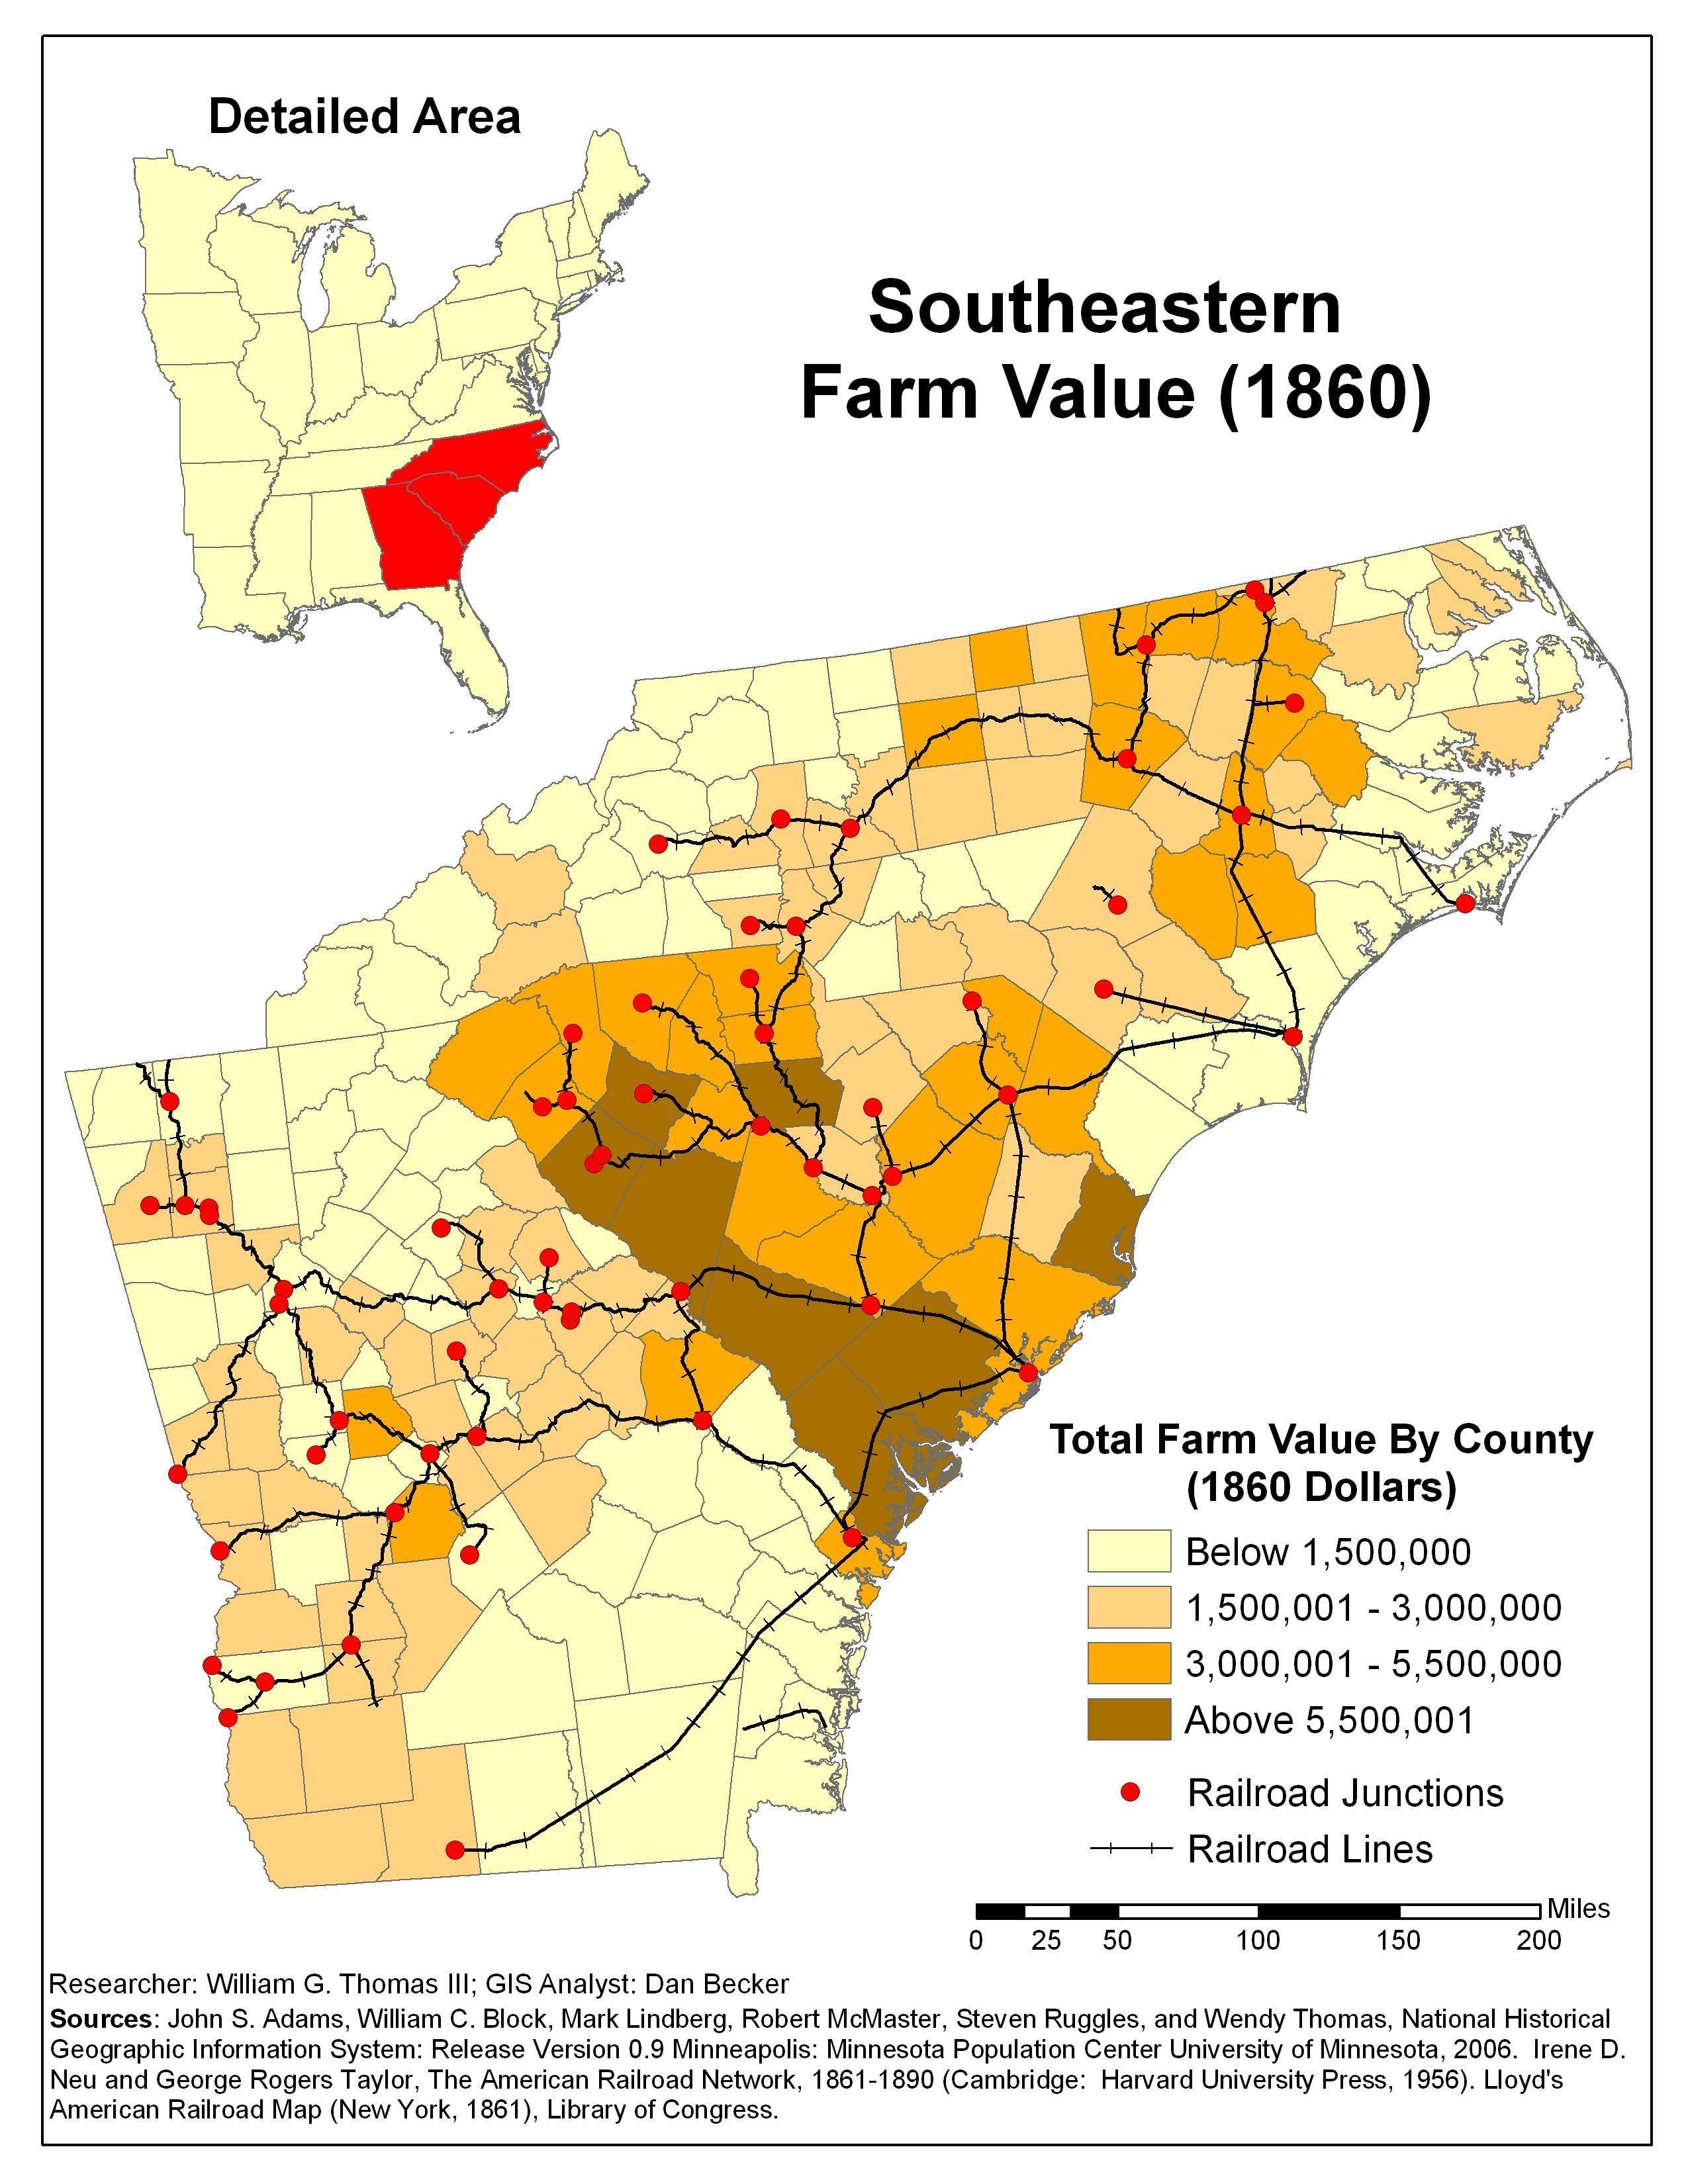 Map Of America 1820.1860 Southeastern Farm Value 1820 1860 Antebellum America Maps